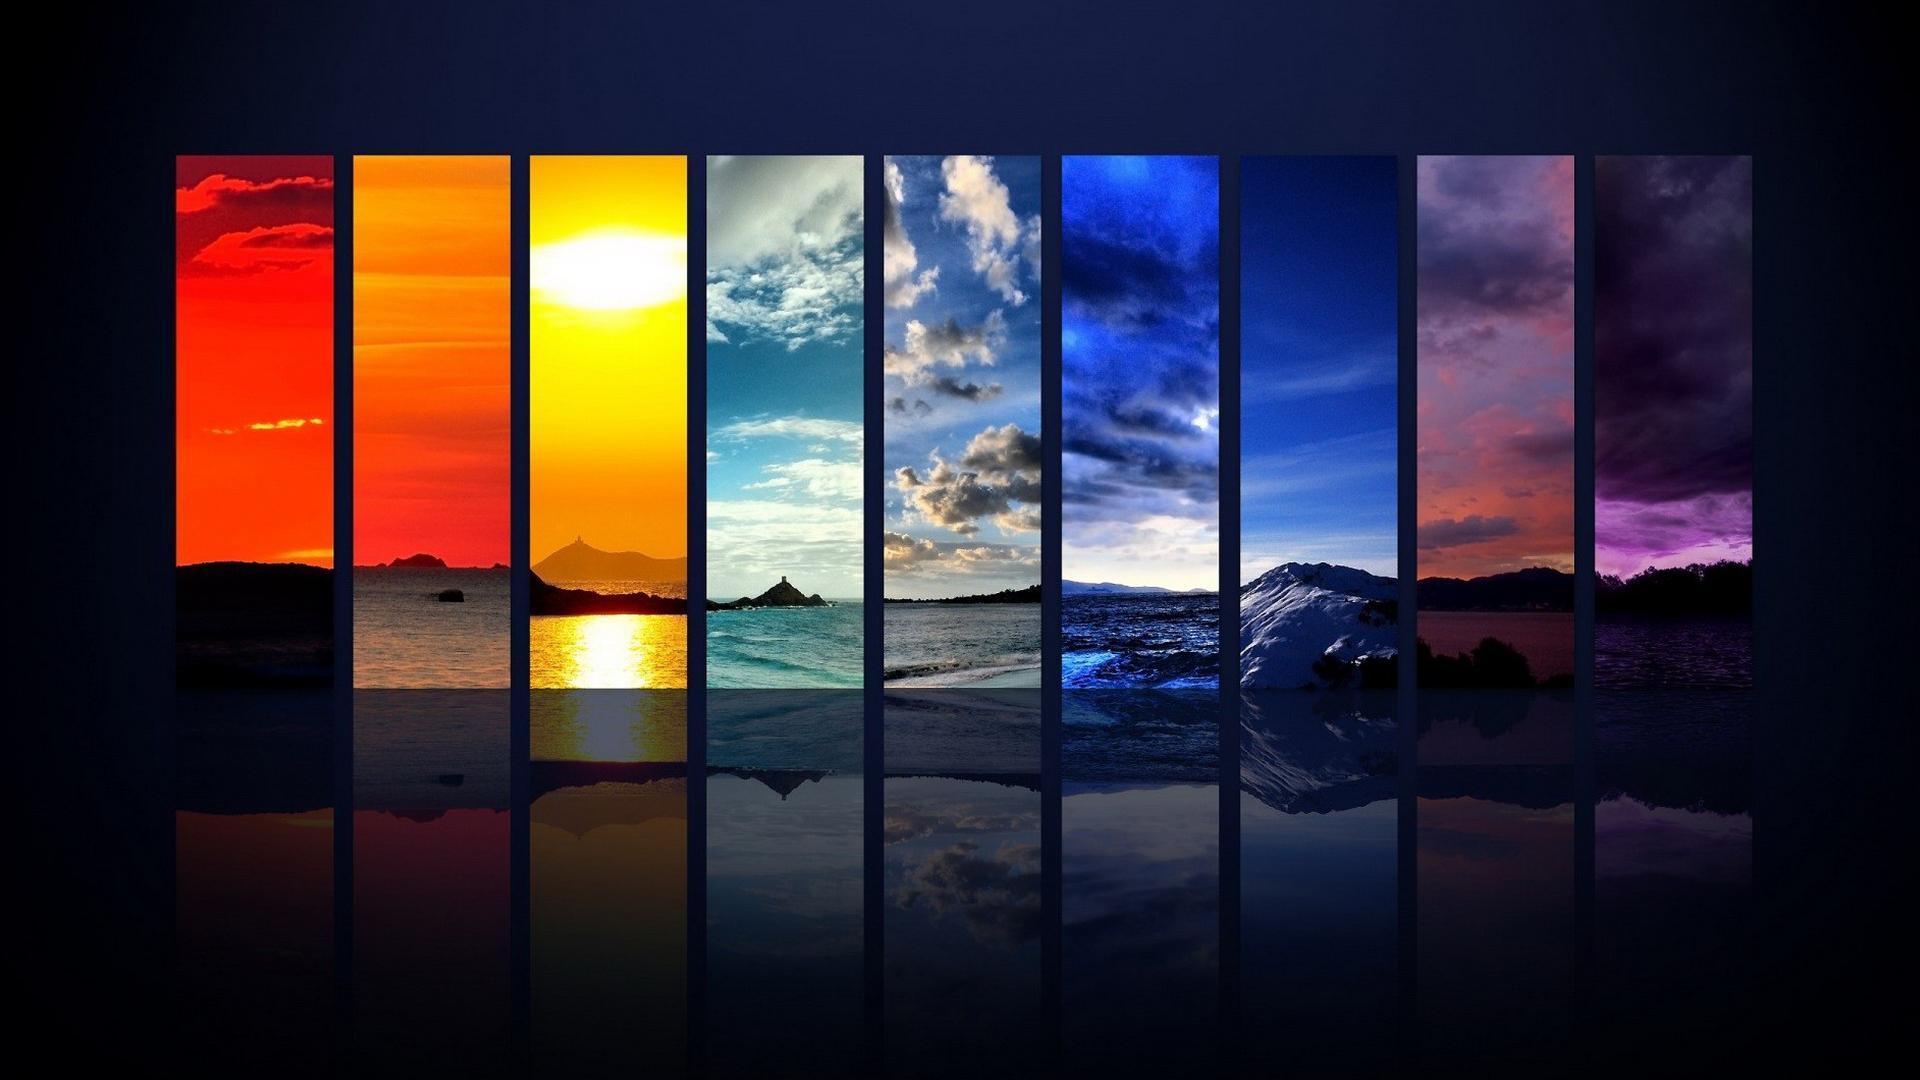 Wallpaper HD Weather And Phenomena Wallpapers | Wallpapers.Smajliji.com